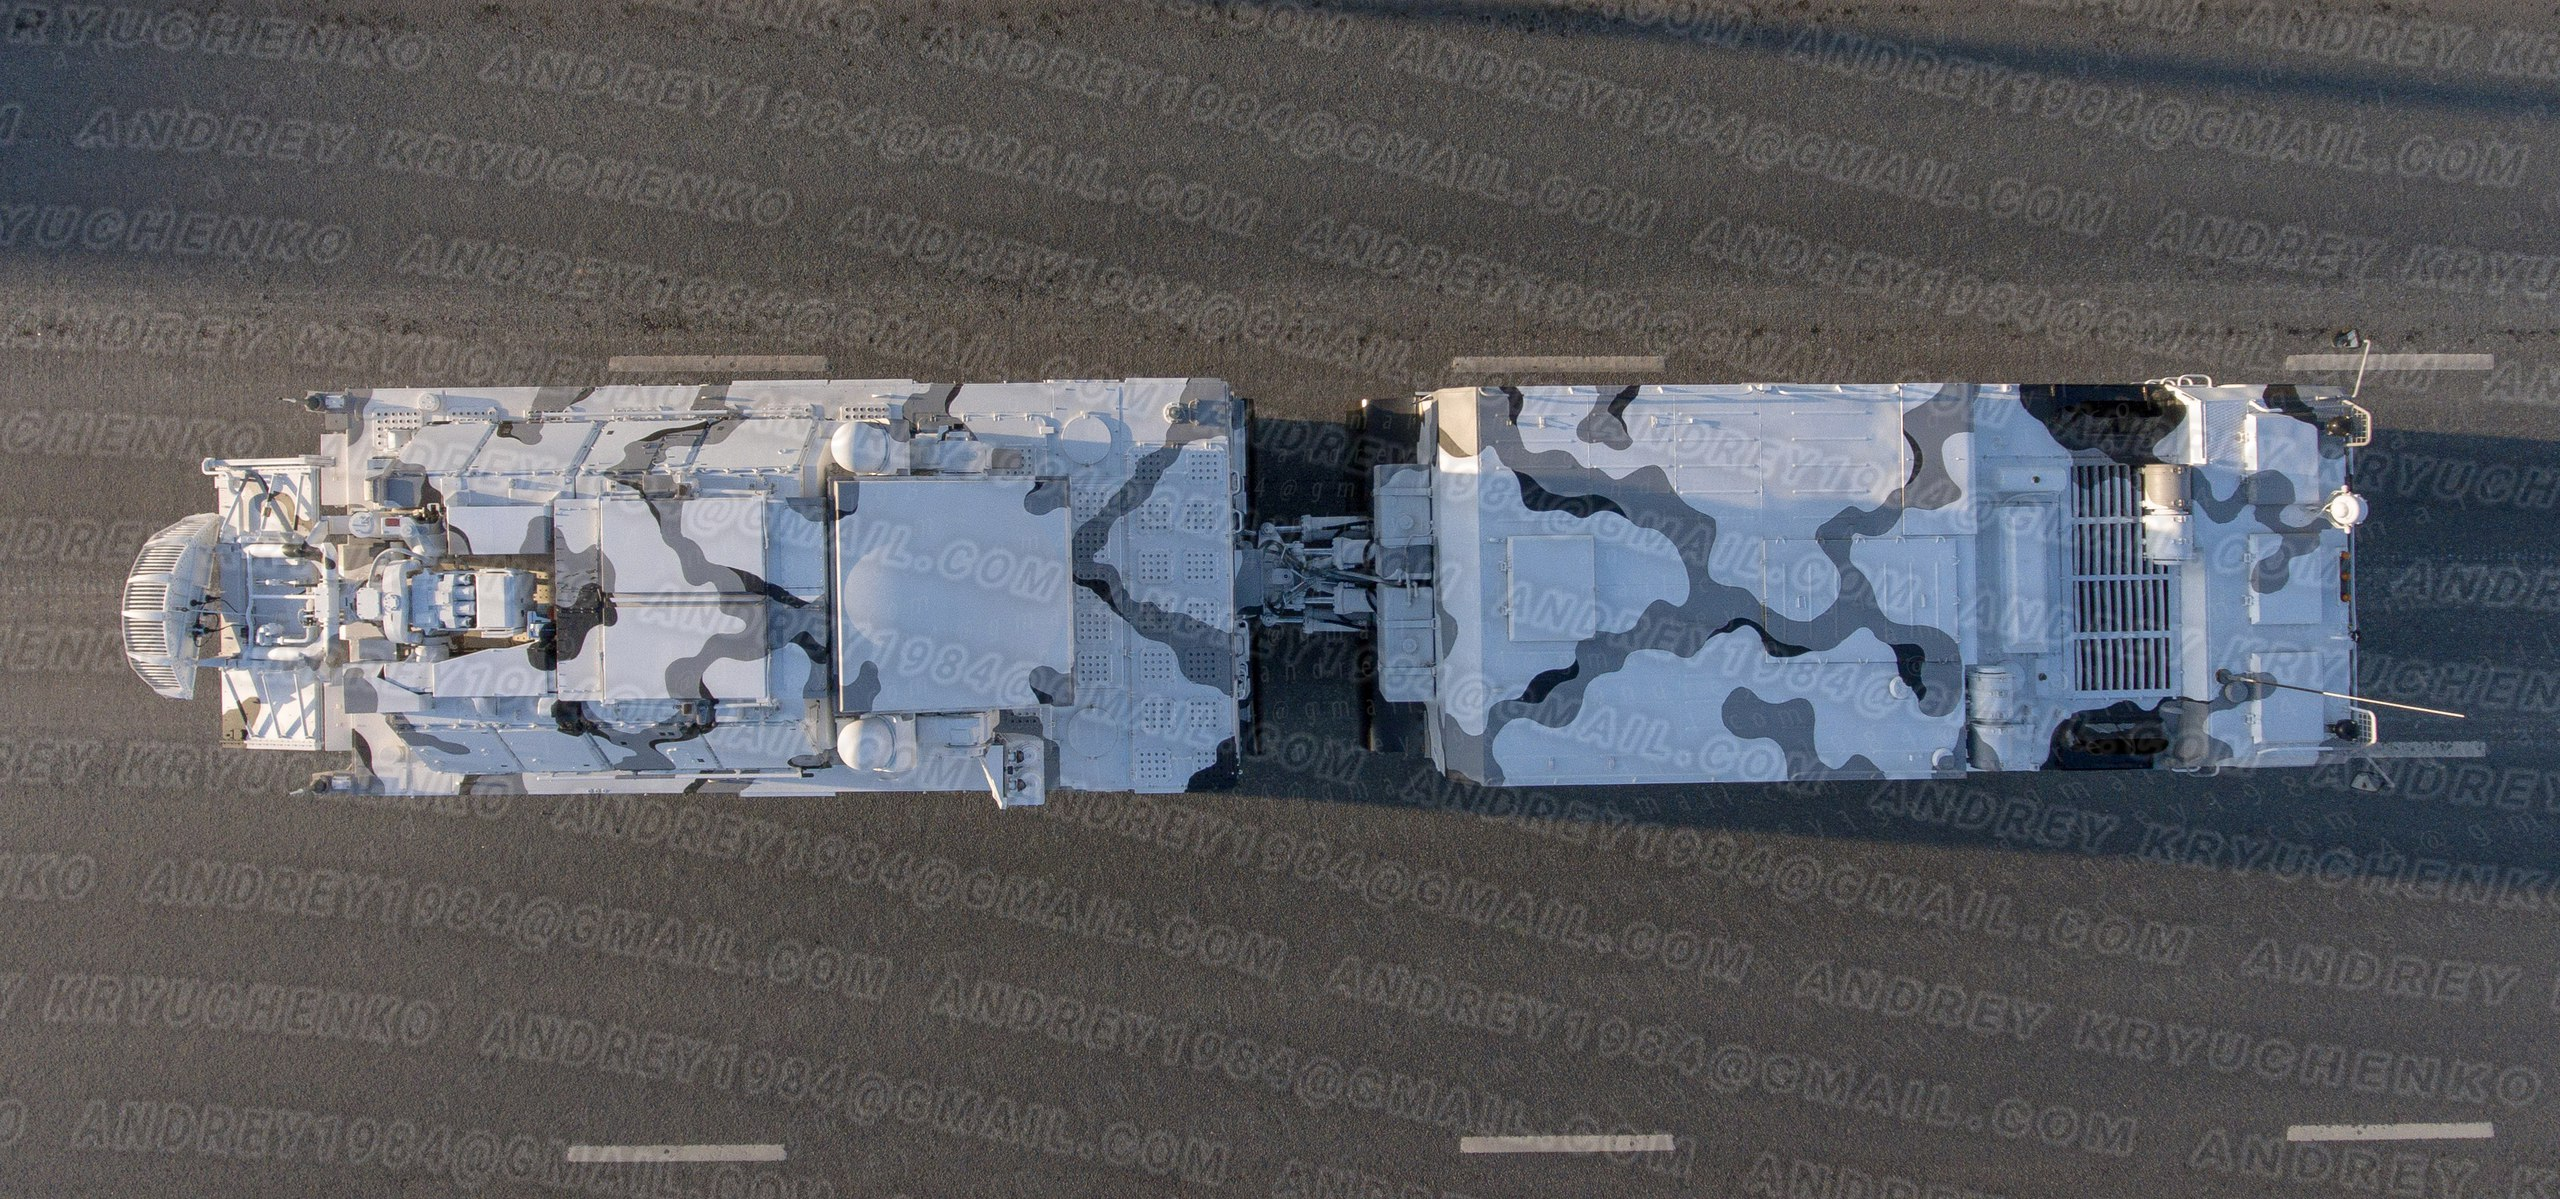 Arctic TELAR Tor-М2DT, top view.